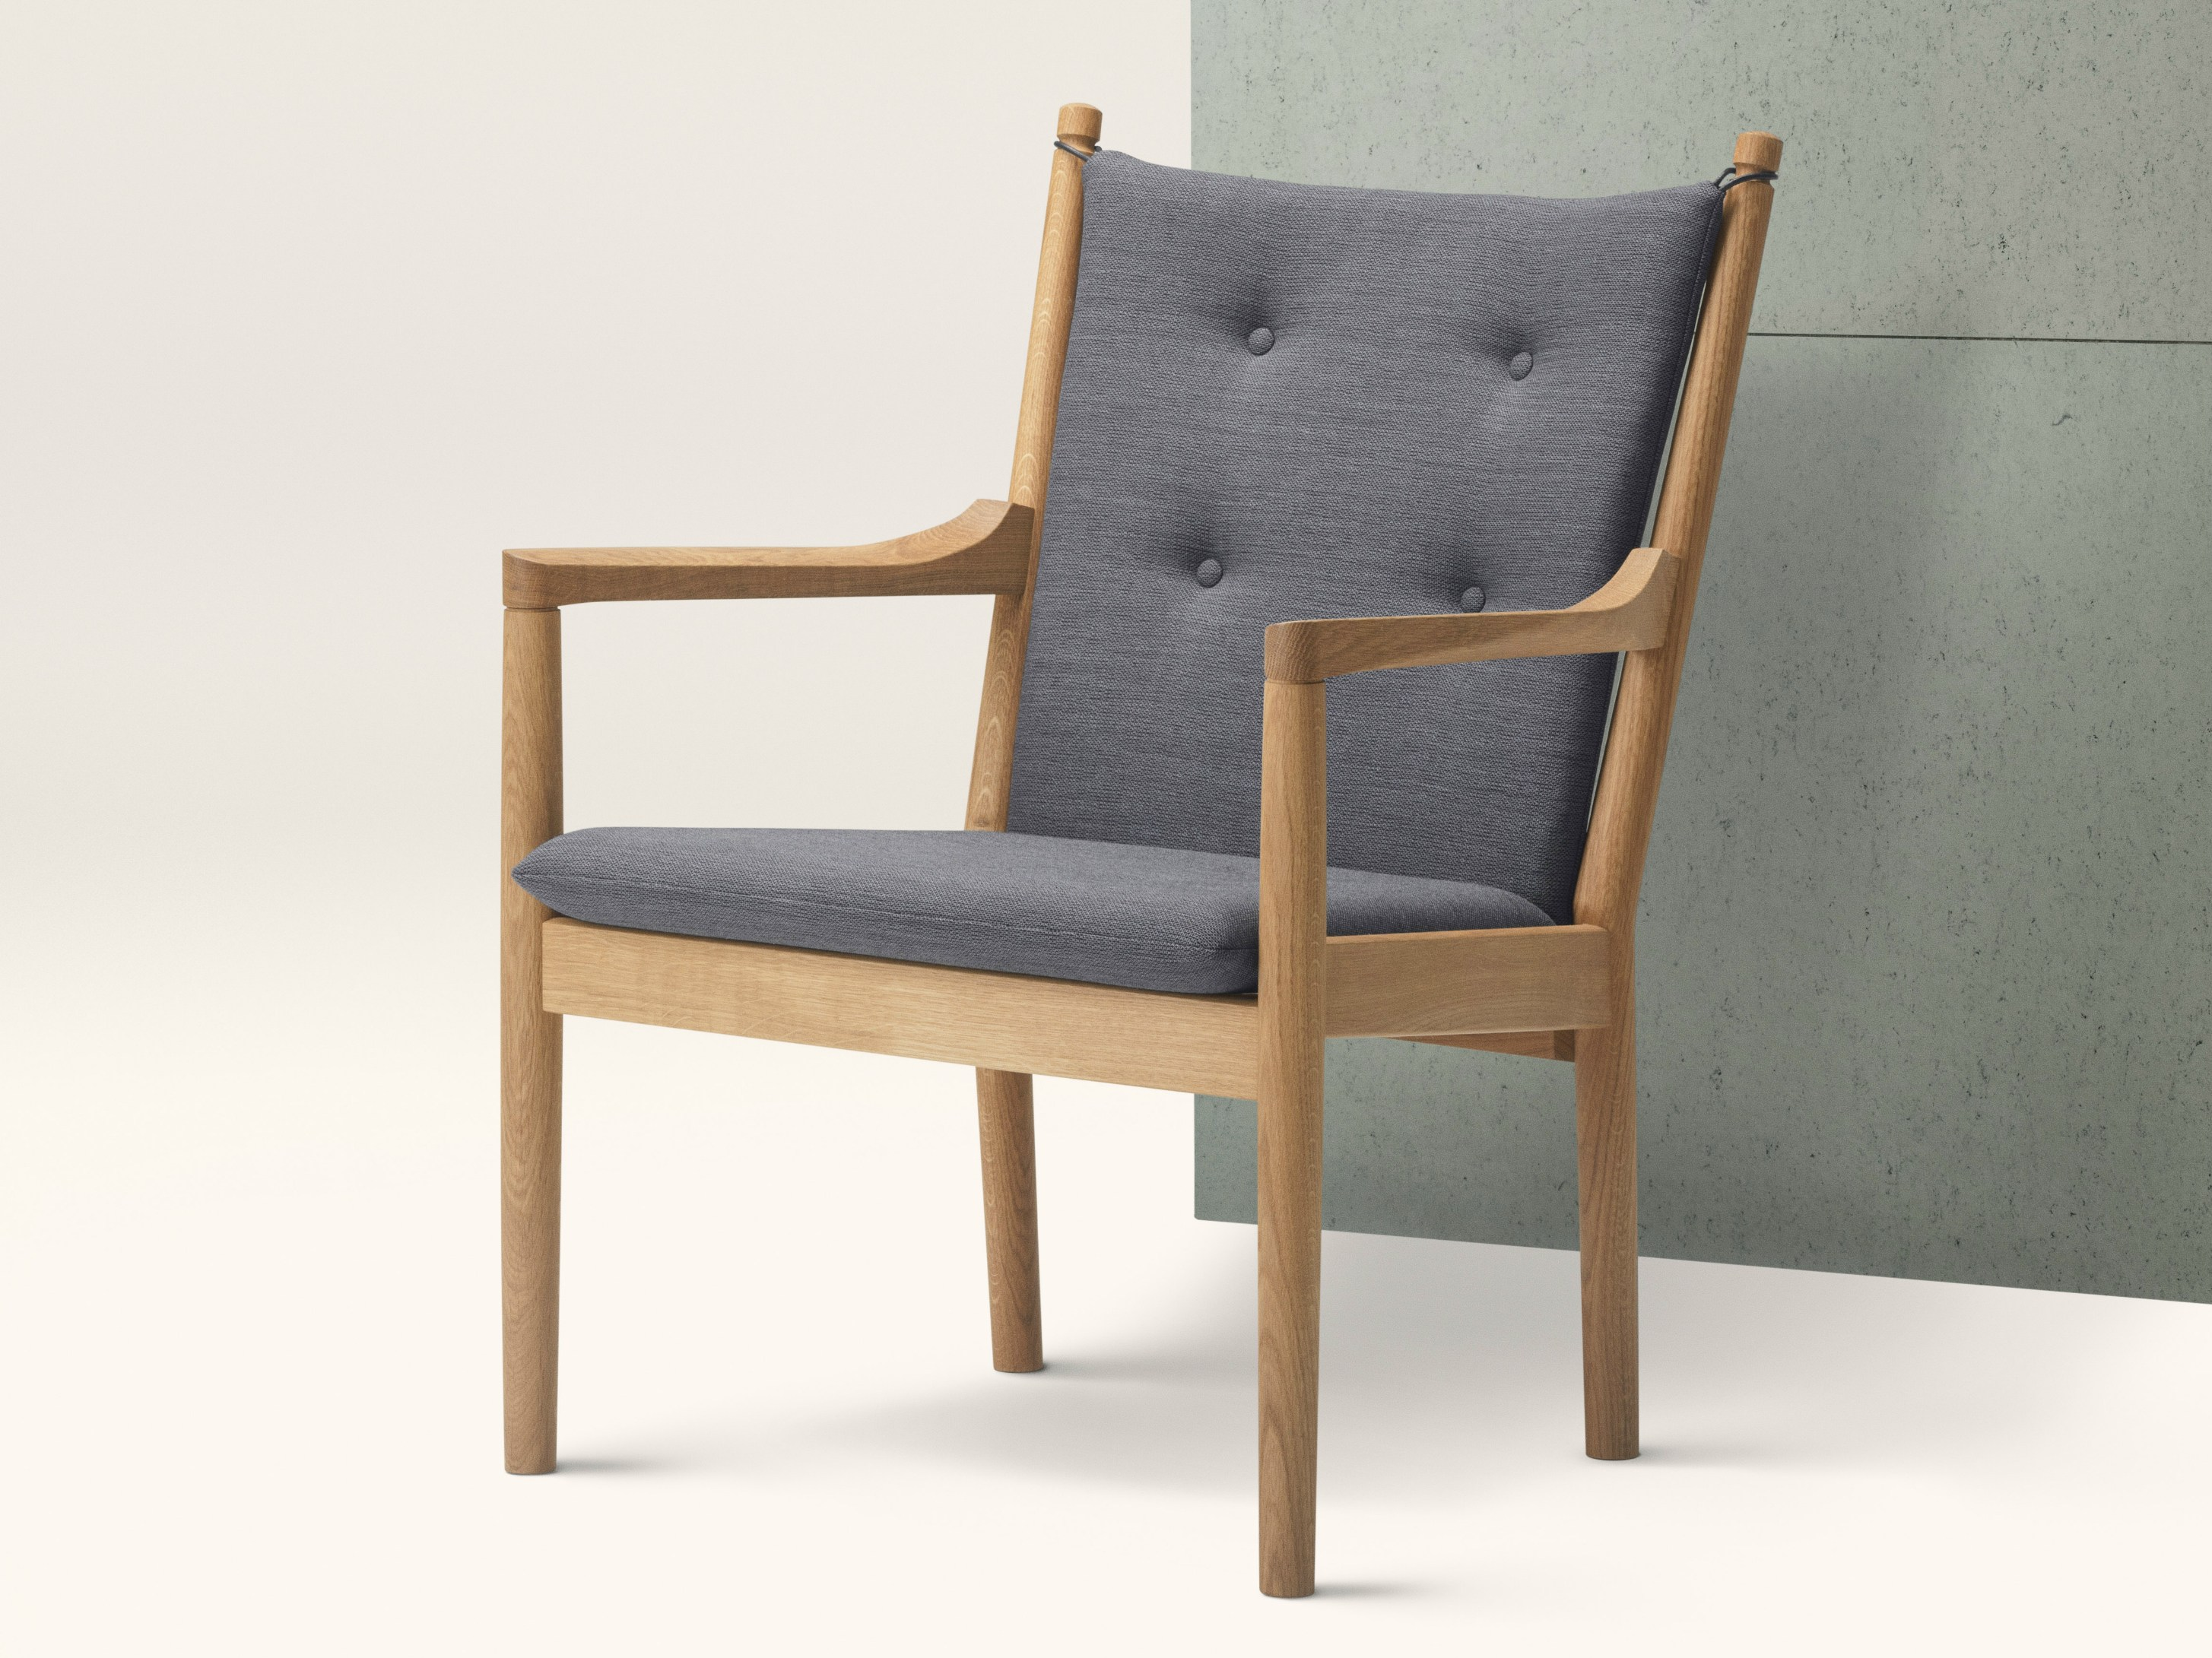 Wooden easy chair designs - 1788 Easy Chair By Fredericia Furniture Design Hans J Wegner B Rge Mogensen